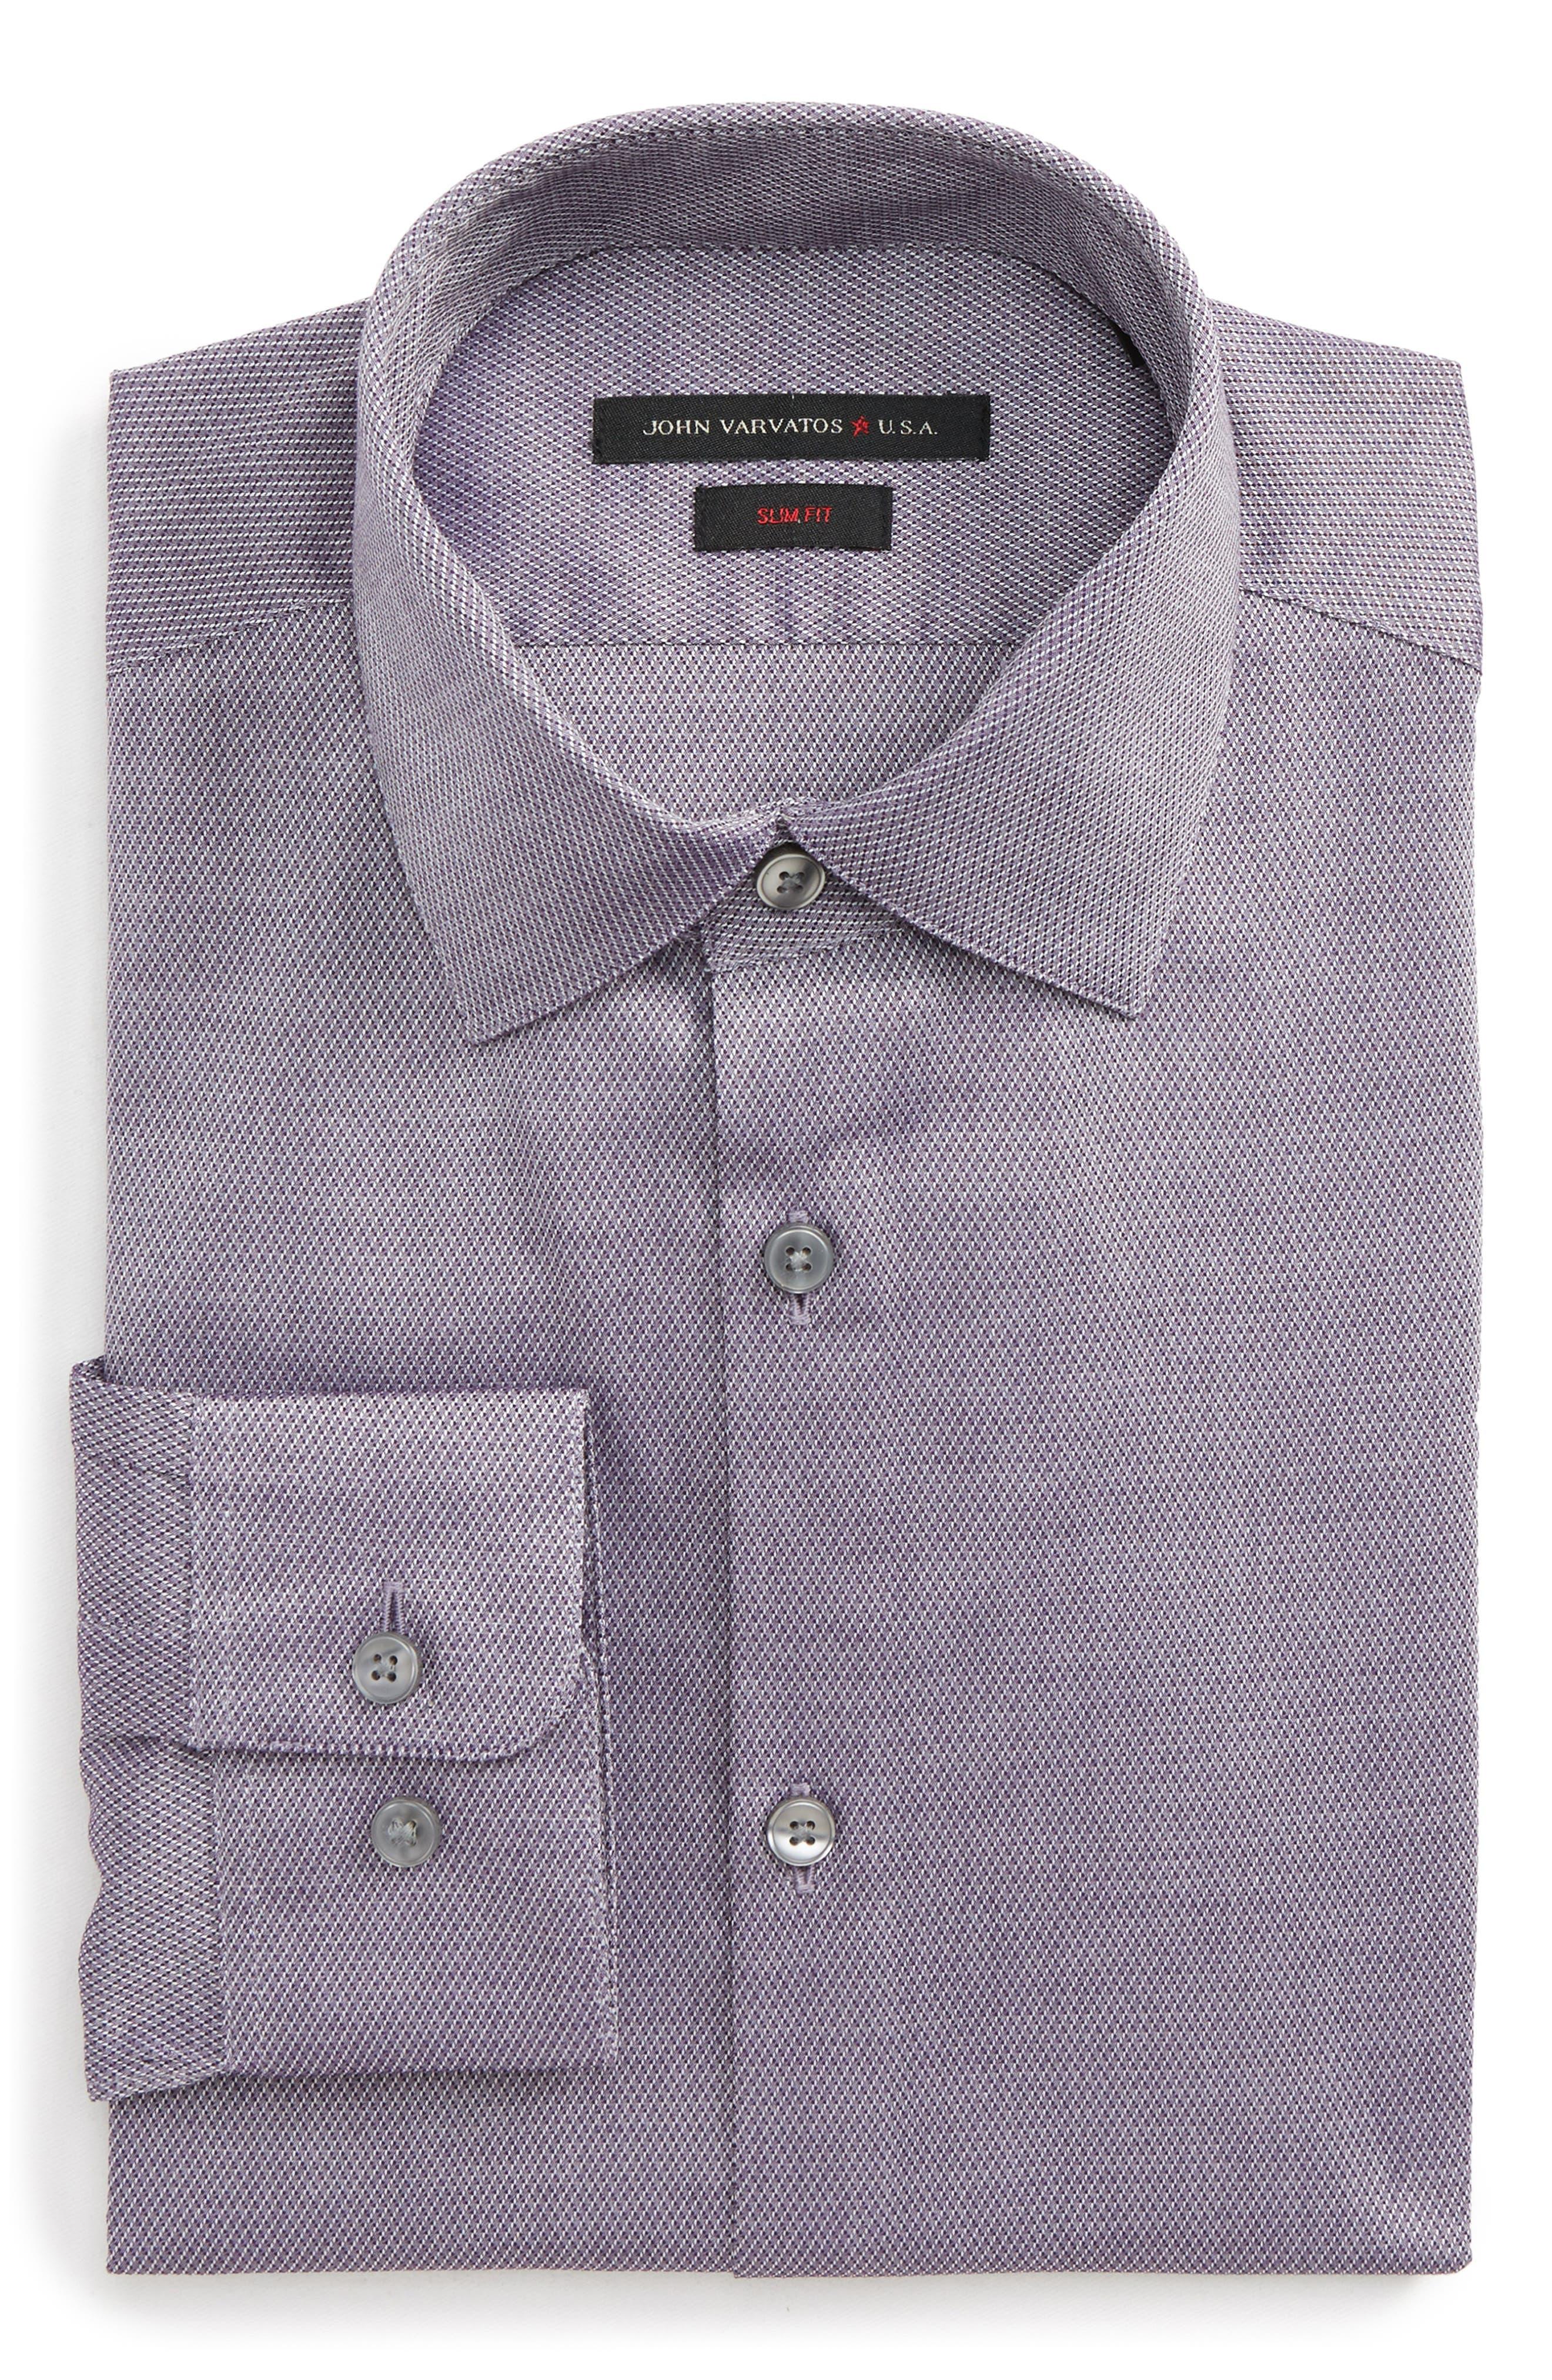 Slim Fit Stretch Geometric Dress Shirt,                         Main,                         color, Purple